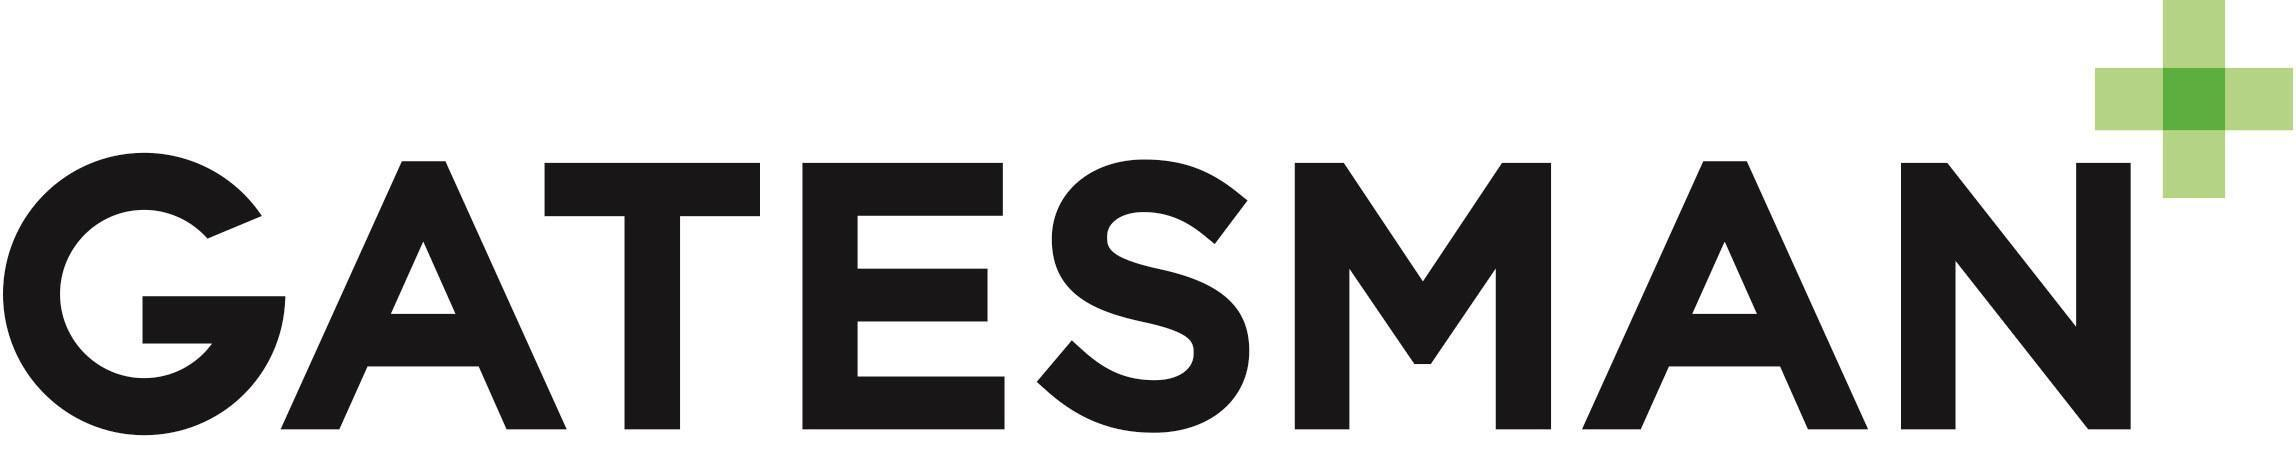 gatesman_logo.jpg